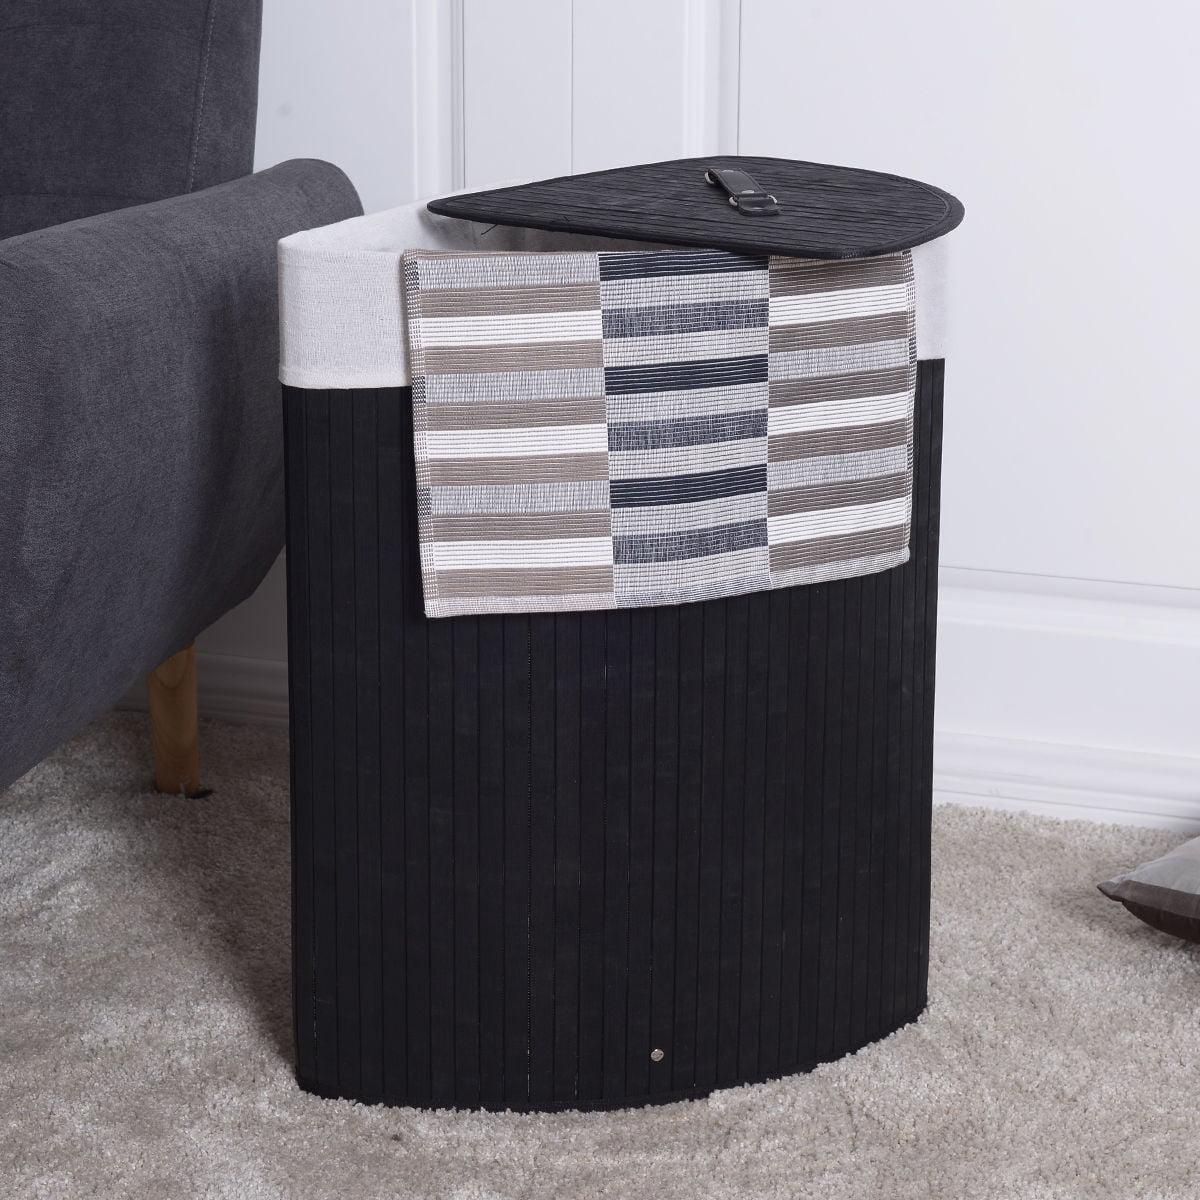 Costway Corner Bamboo Hamper Laundry Basket Washing Cloth Bin Storage Bag Lid Black by Costway